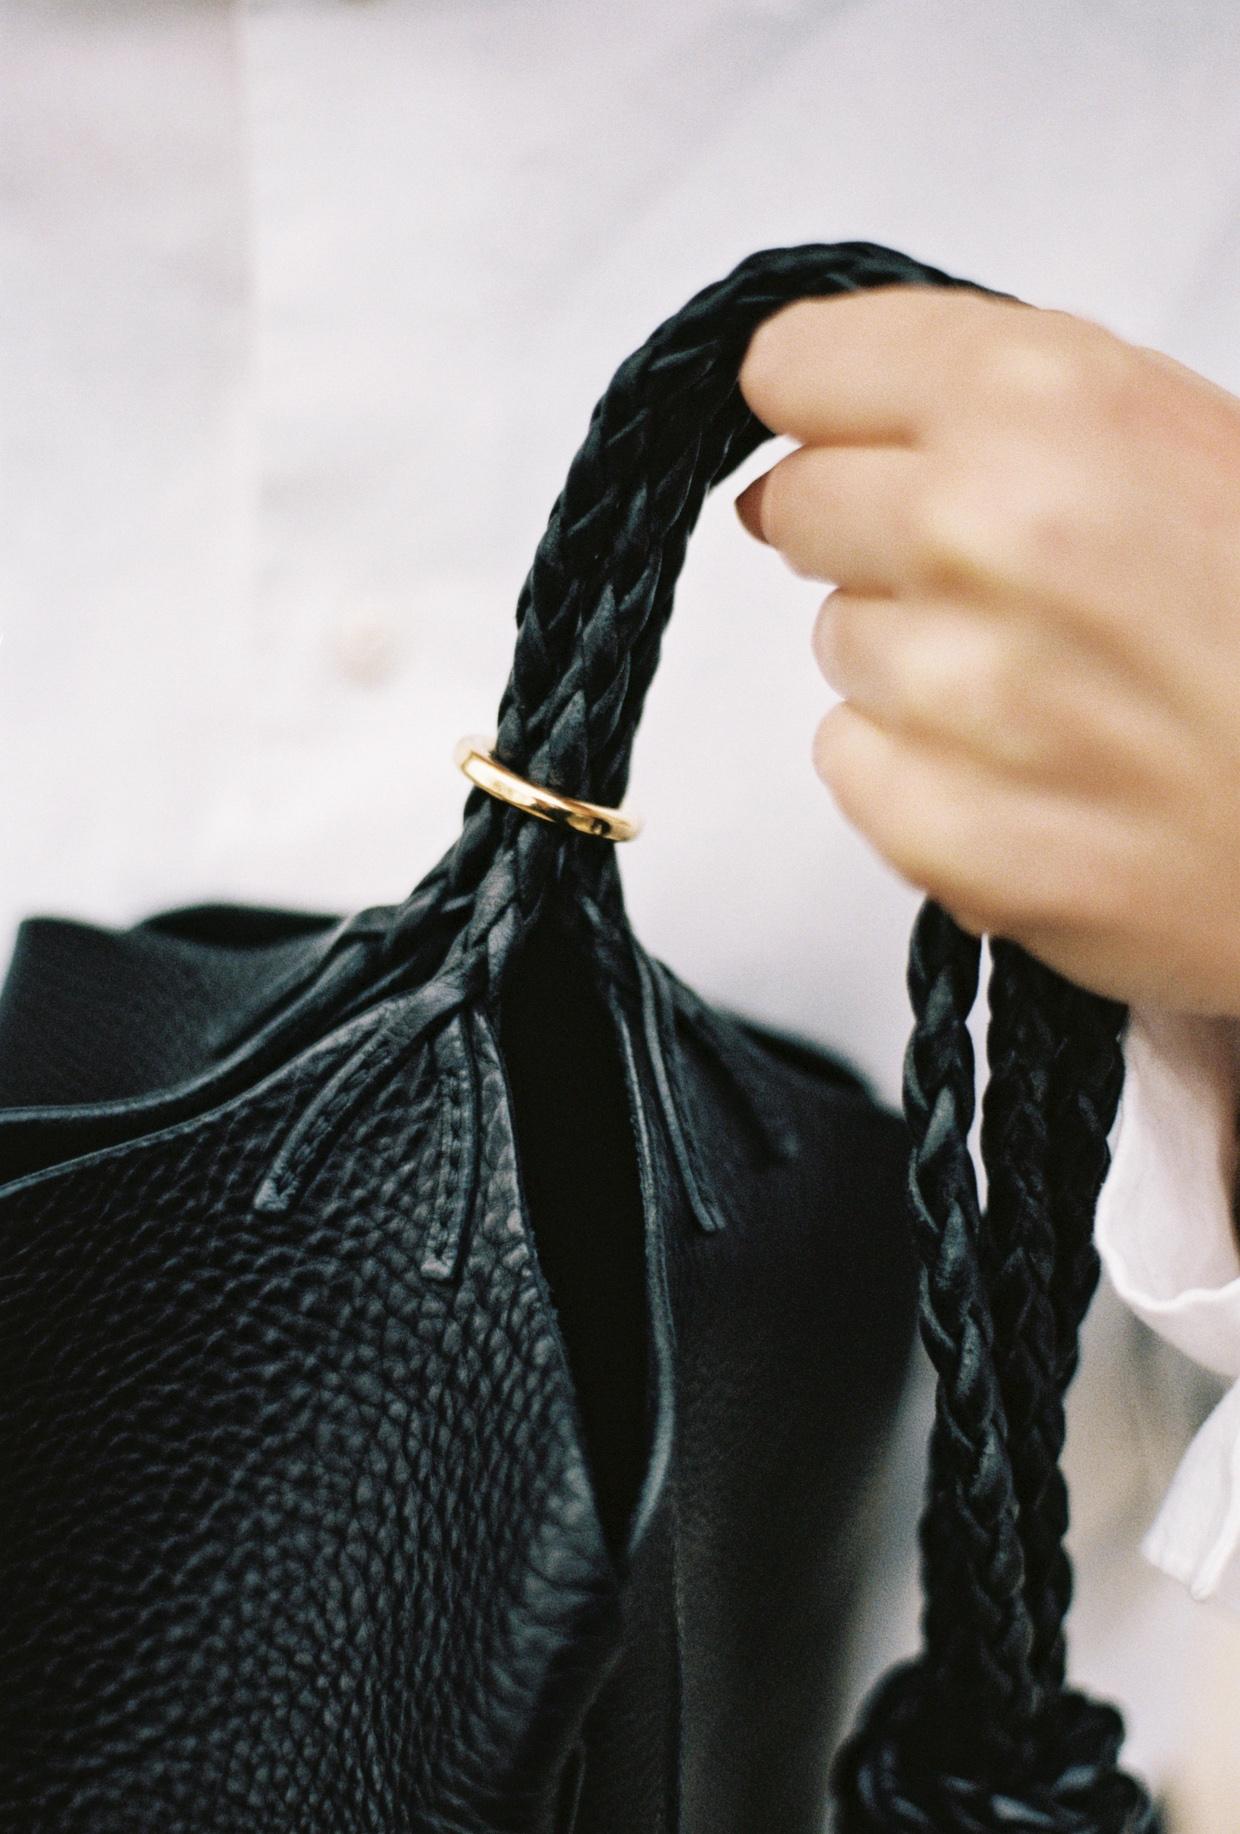 Copy of mark tallowin designer handbag baluchon